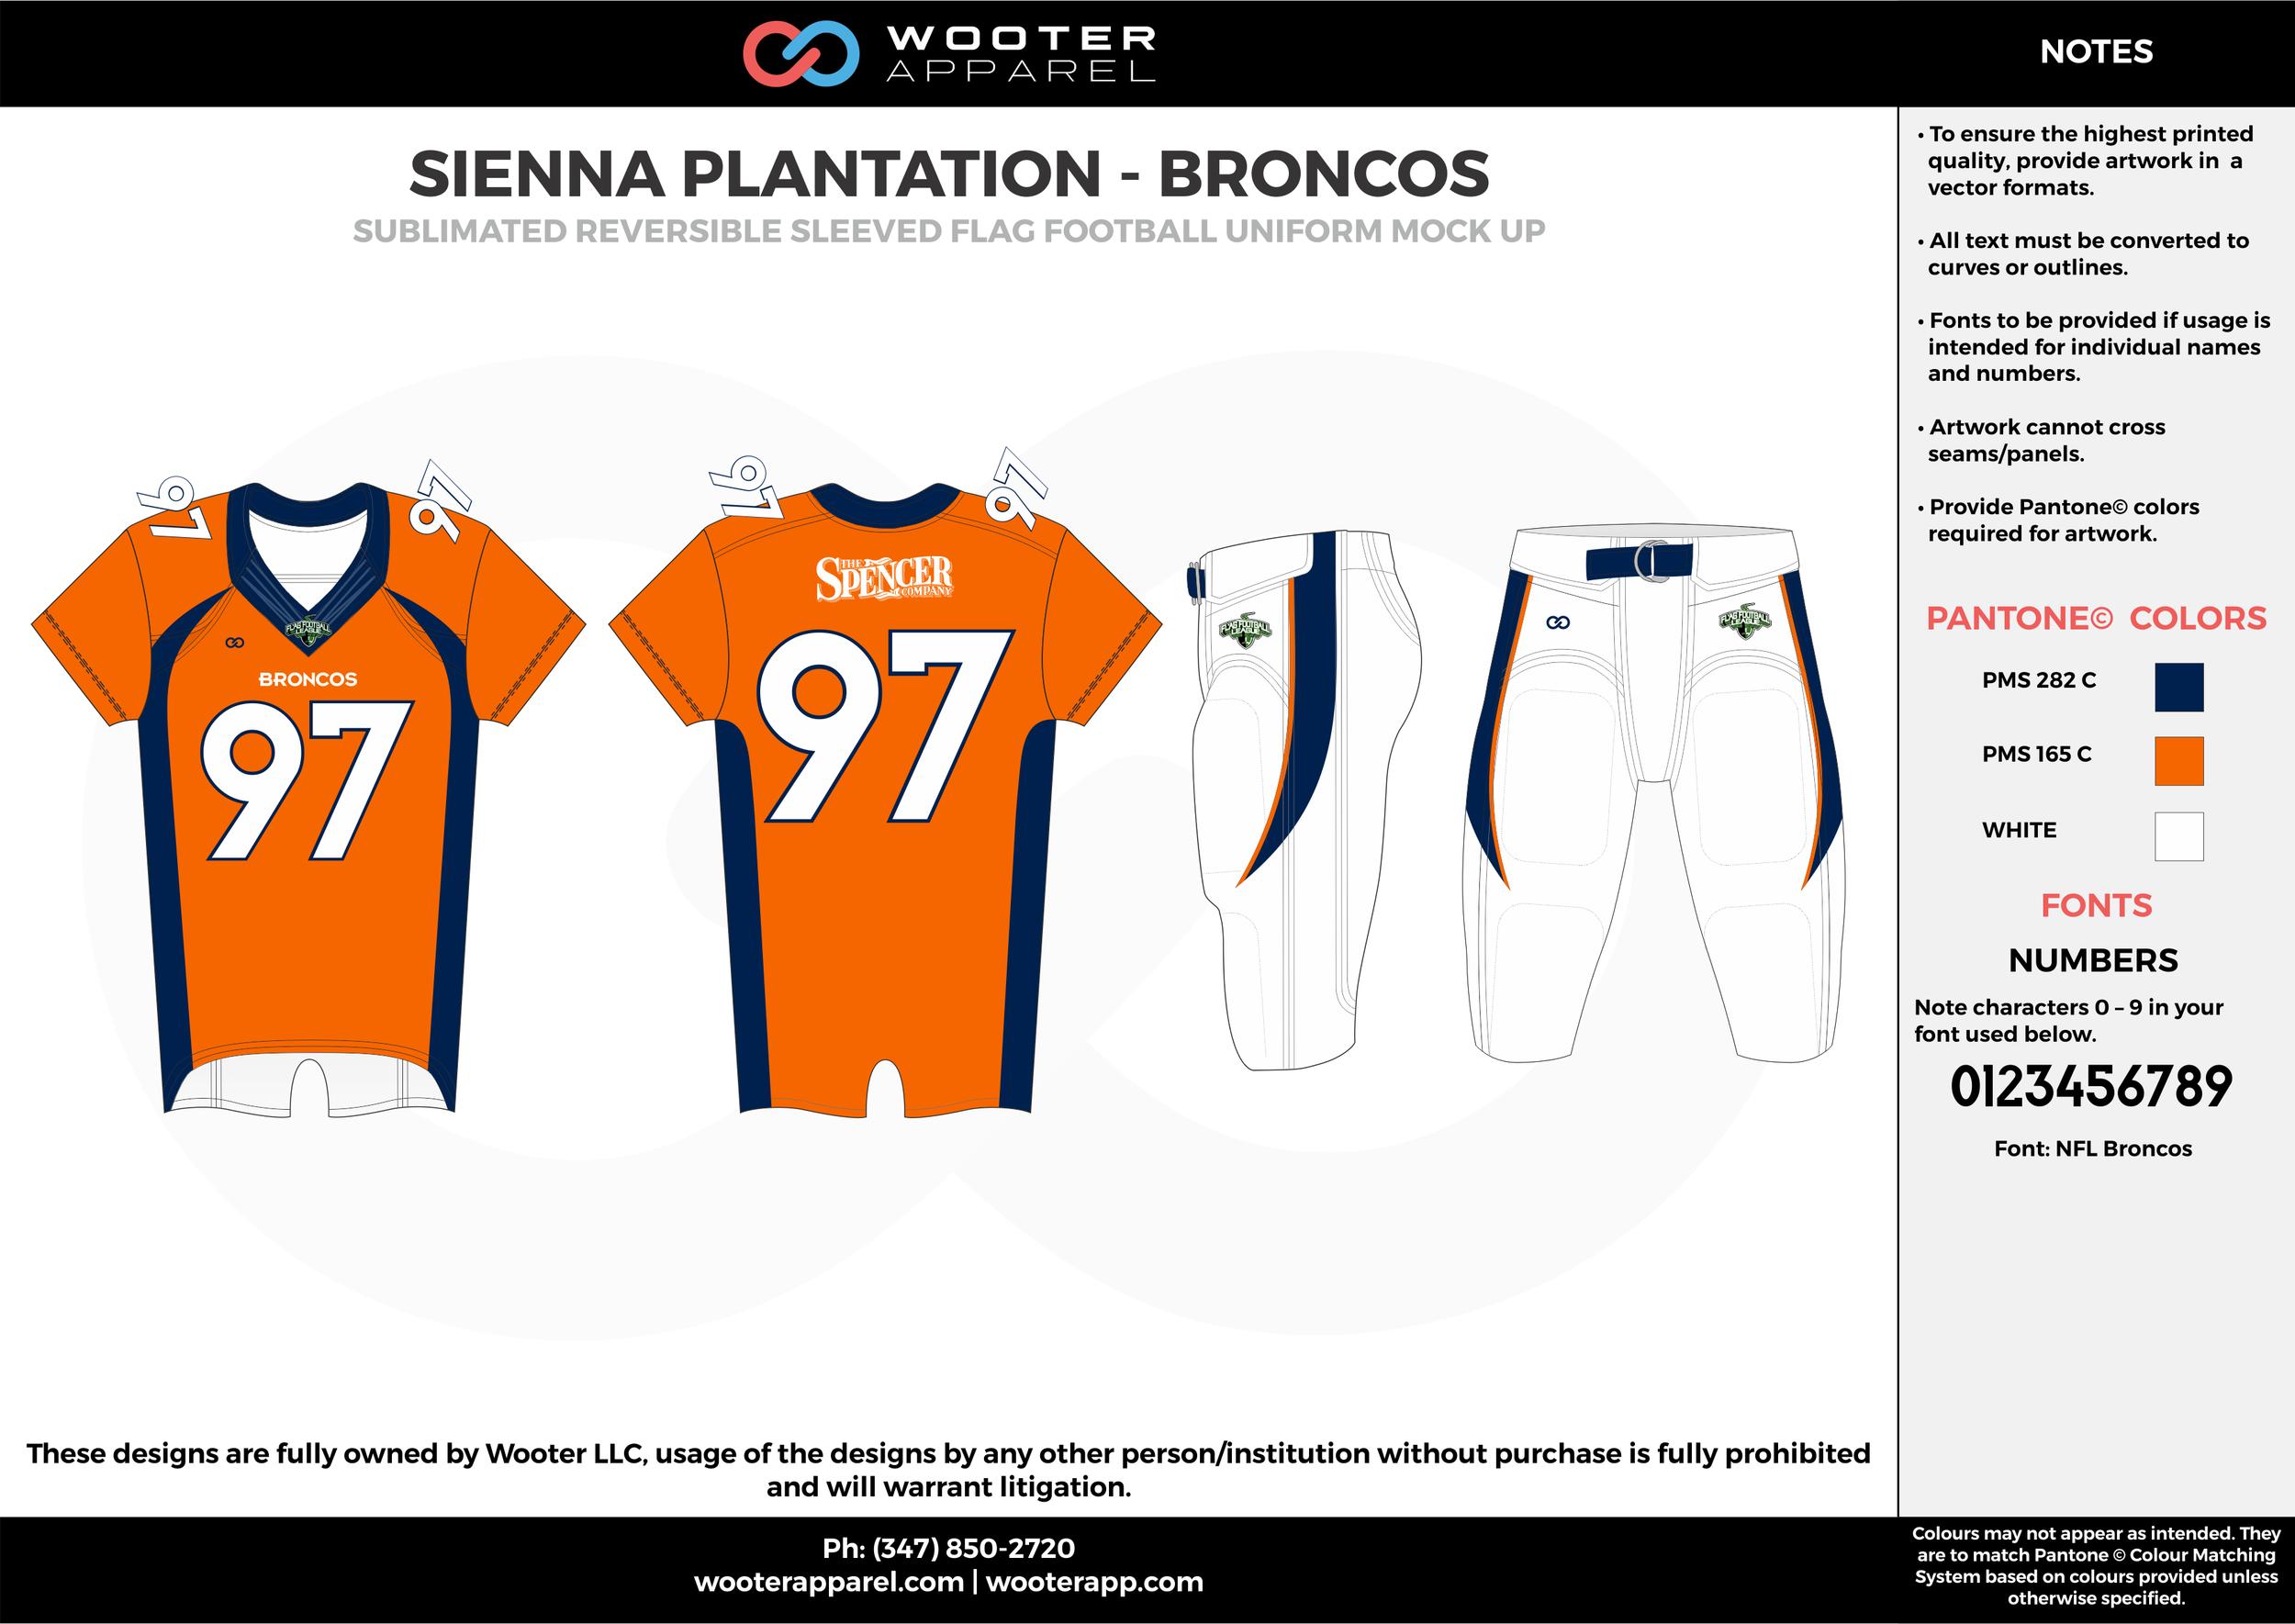 SIENNA PLANTATION- BRONCOS orange white dark blue Football Uniform, Jersey, Pants, Integraded